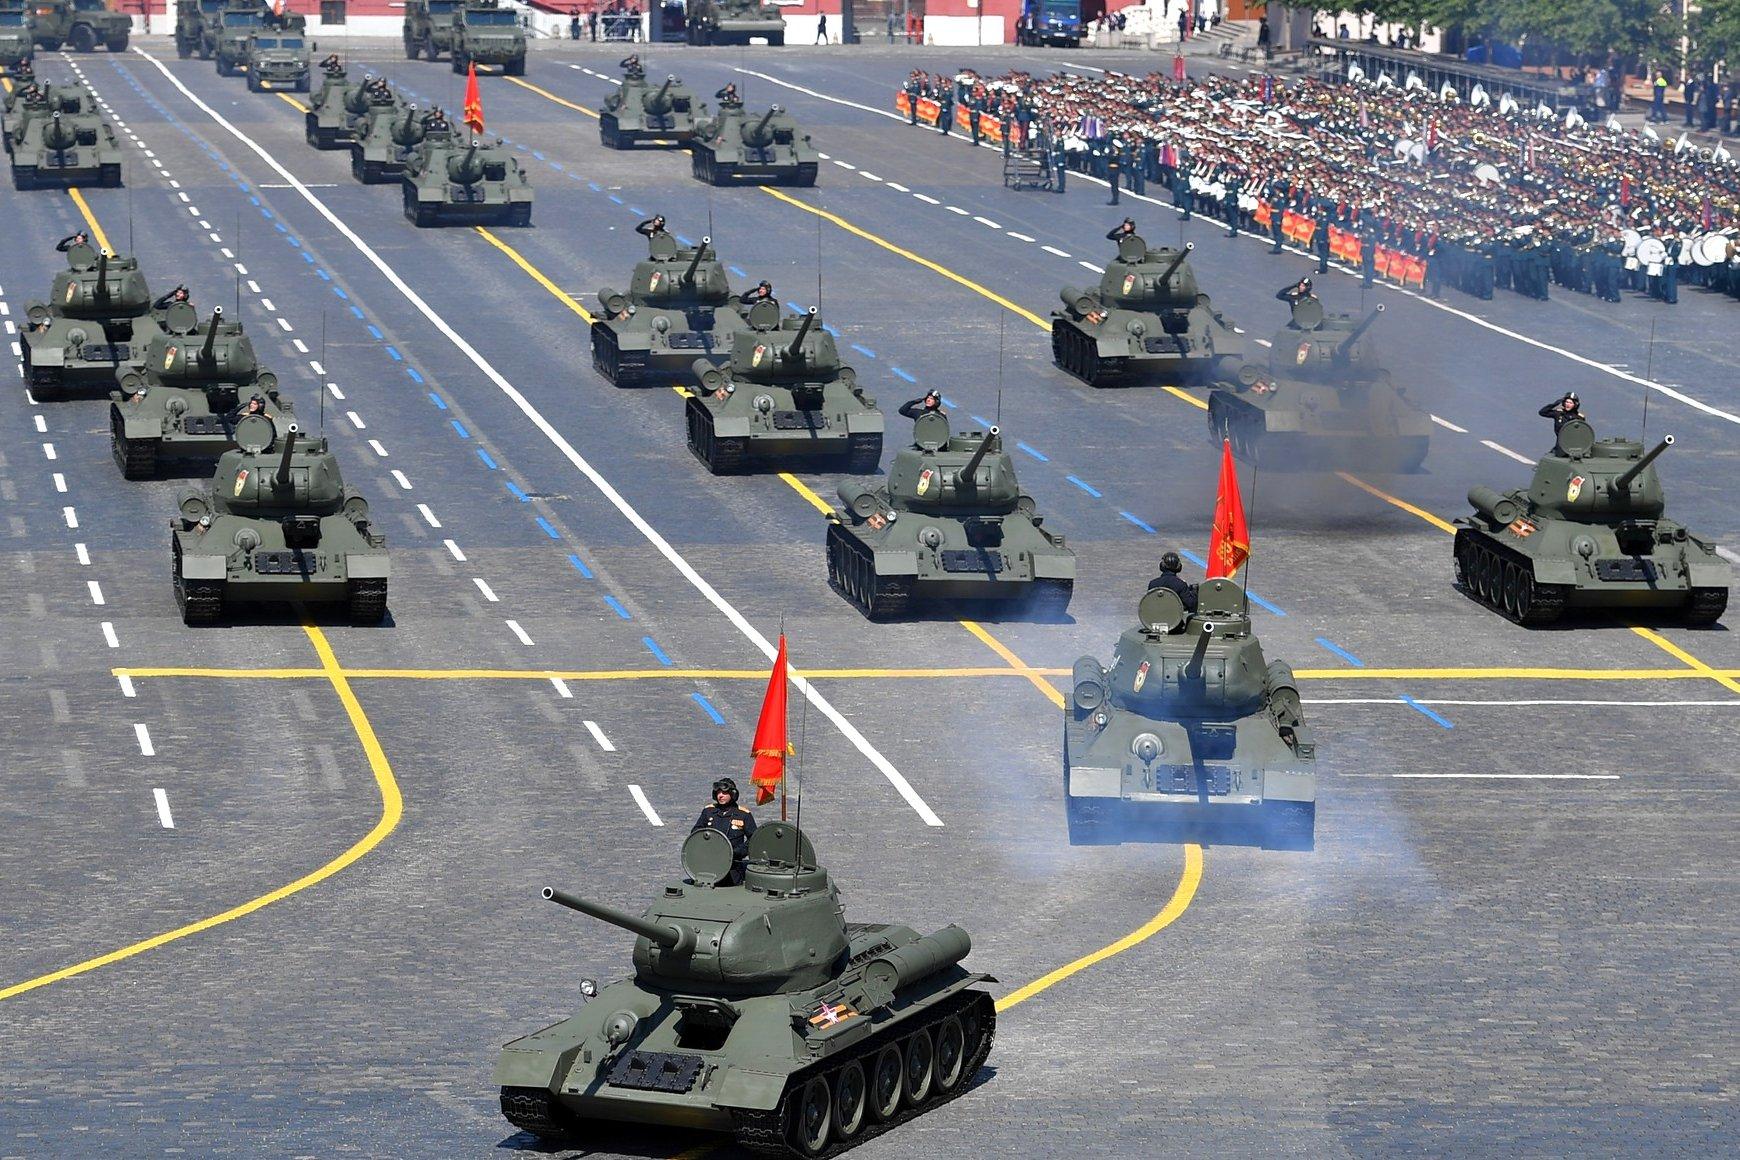 Tenkovska brigada ruske armije tokom vojne parade na Crvenom trgu povodom Dana pobede u Drugom svetskom ratu, Moskva, 24. jun 2020. (Foto: kremlin.ru)